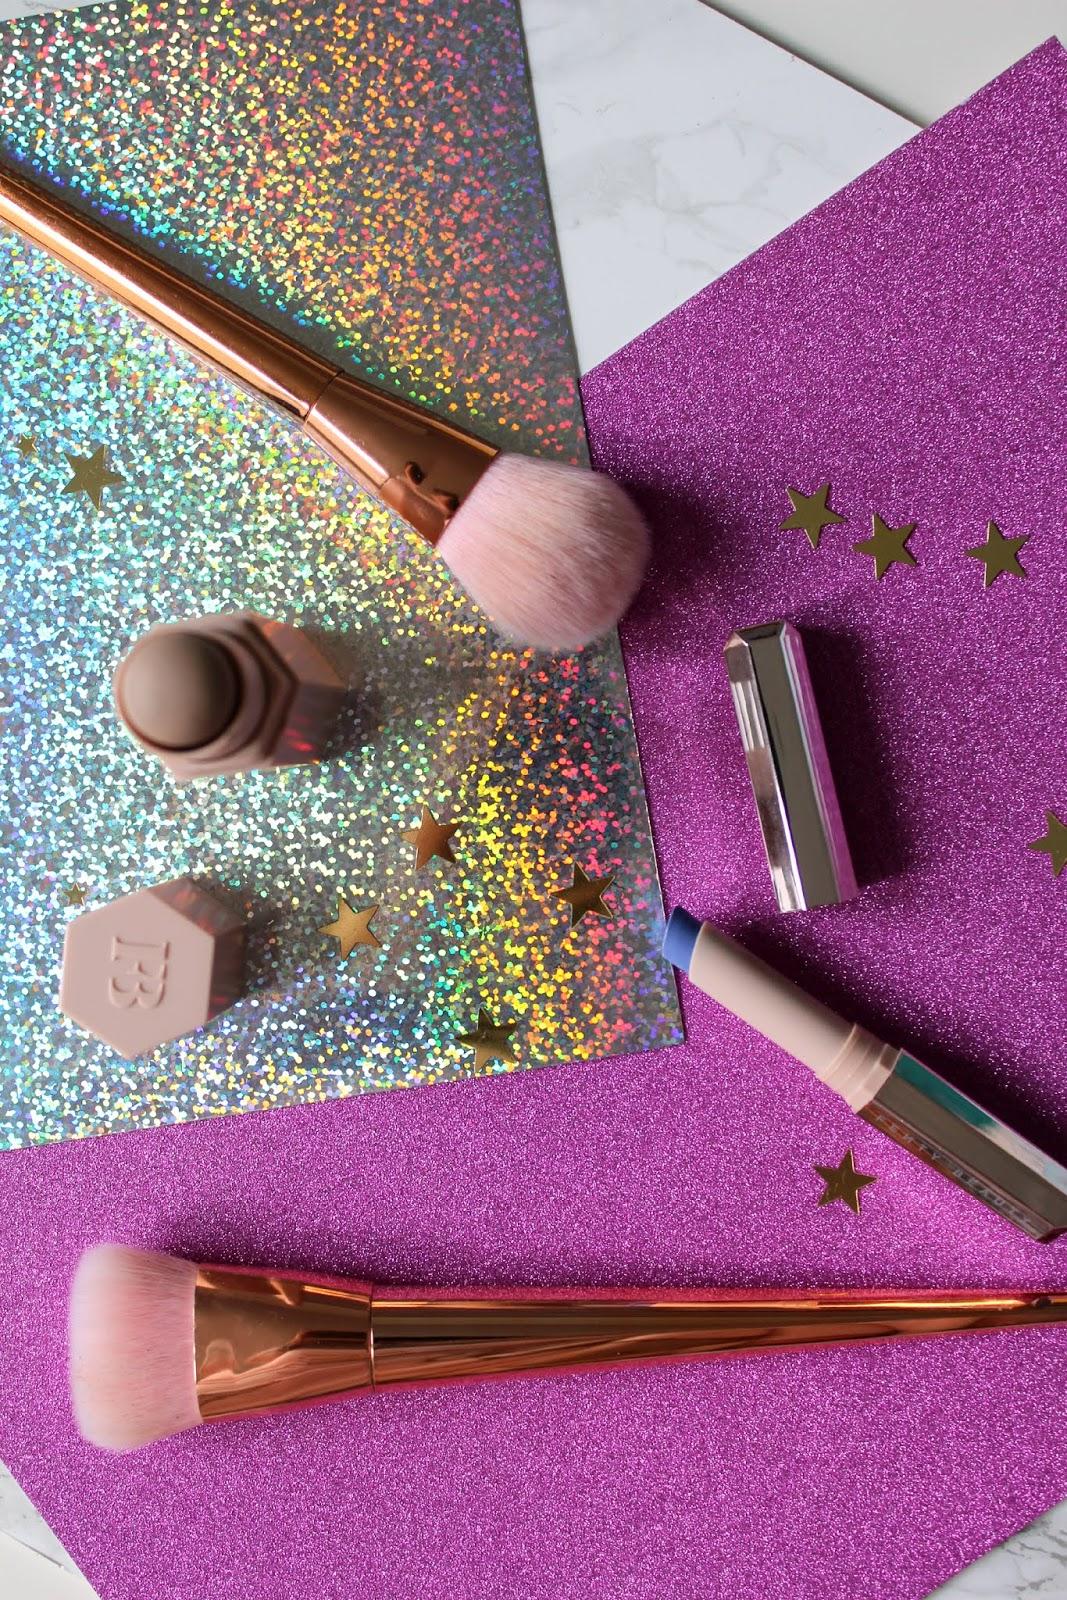 fenty beauty cosmetics, mattemoiselle lipstick ya dig?!, amber match stix contour, swatches, review, first impressions